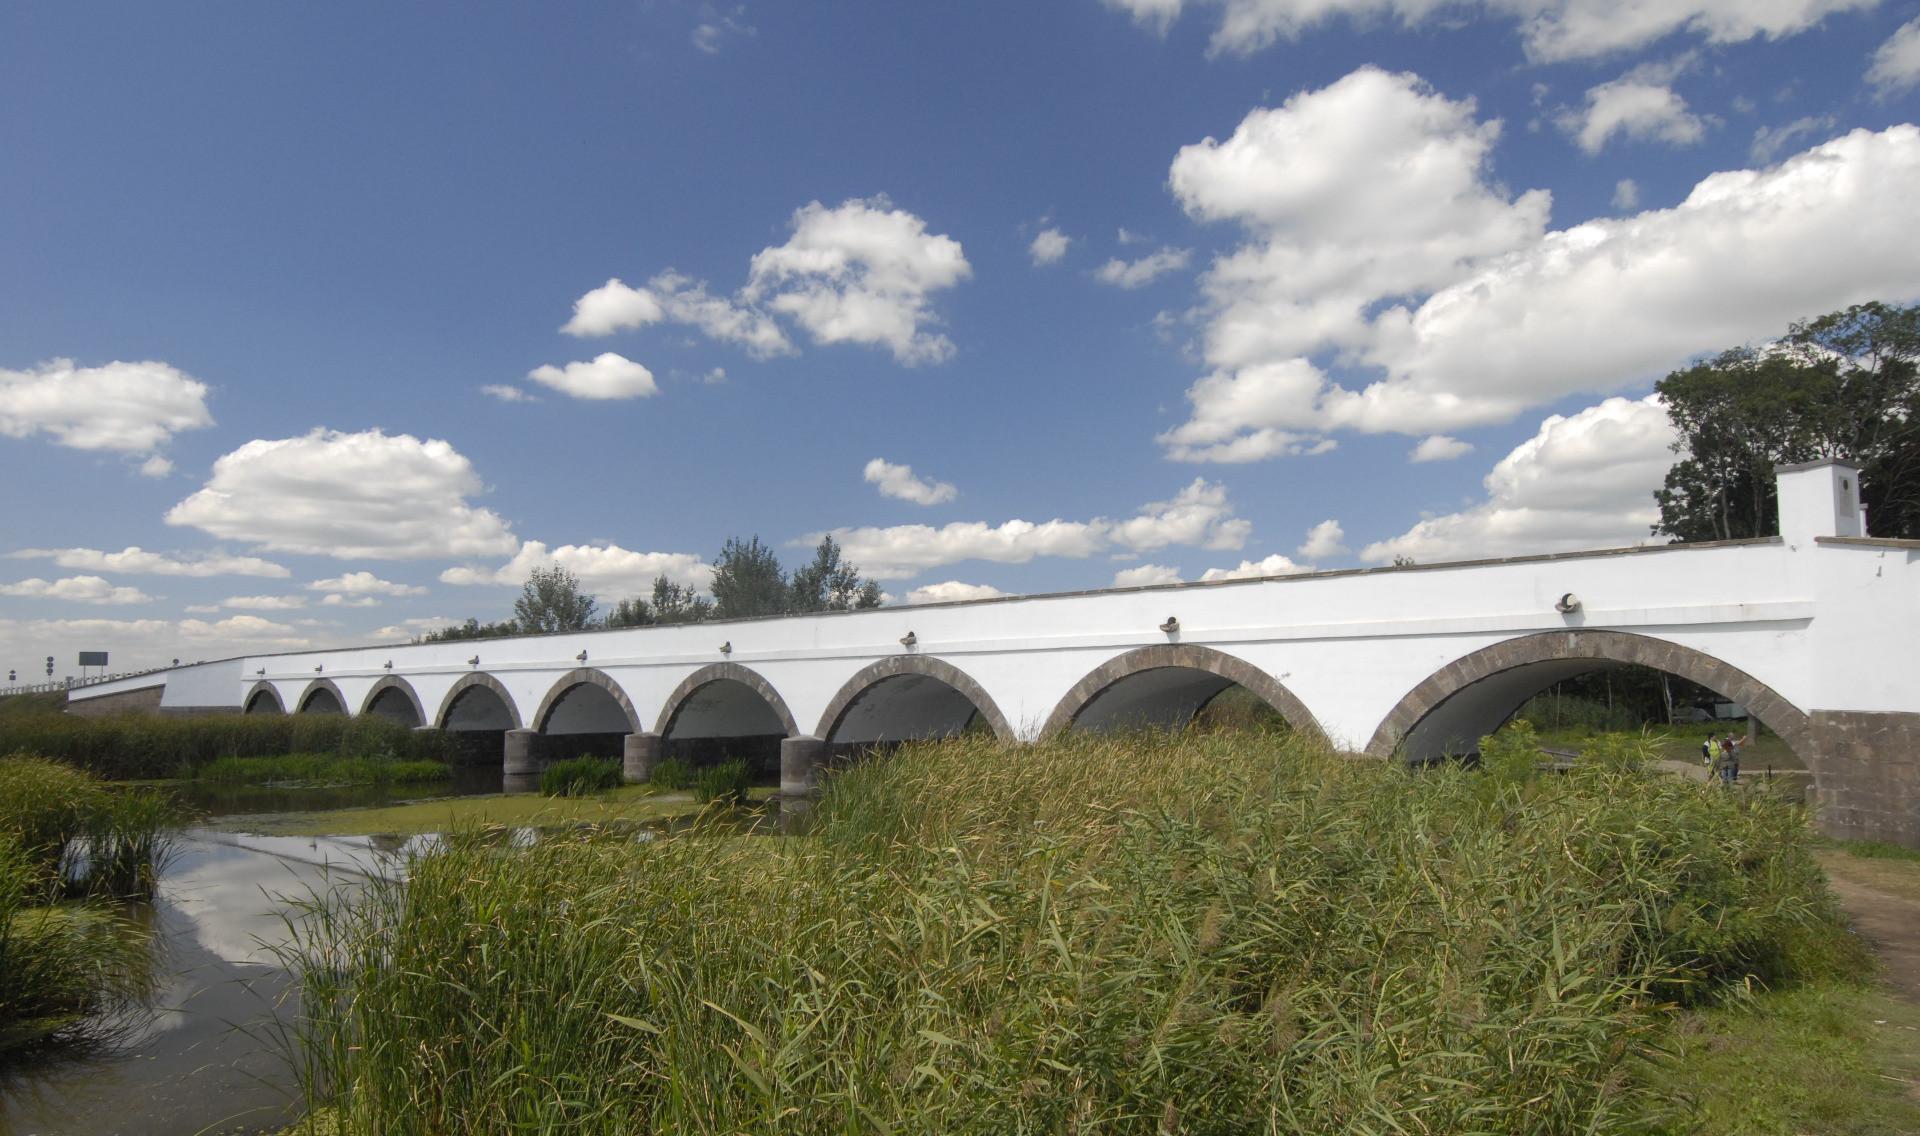 Neun-Bogen-Brücke in Hortobágy